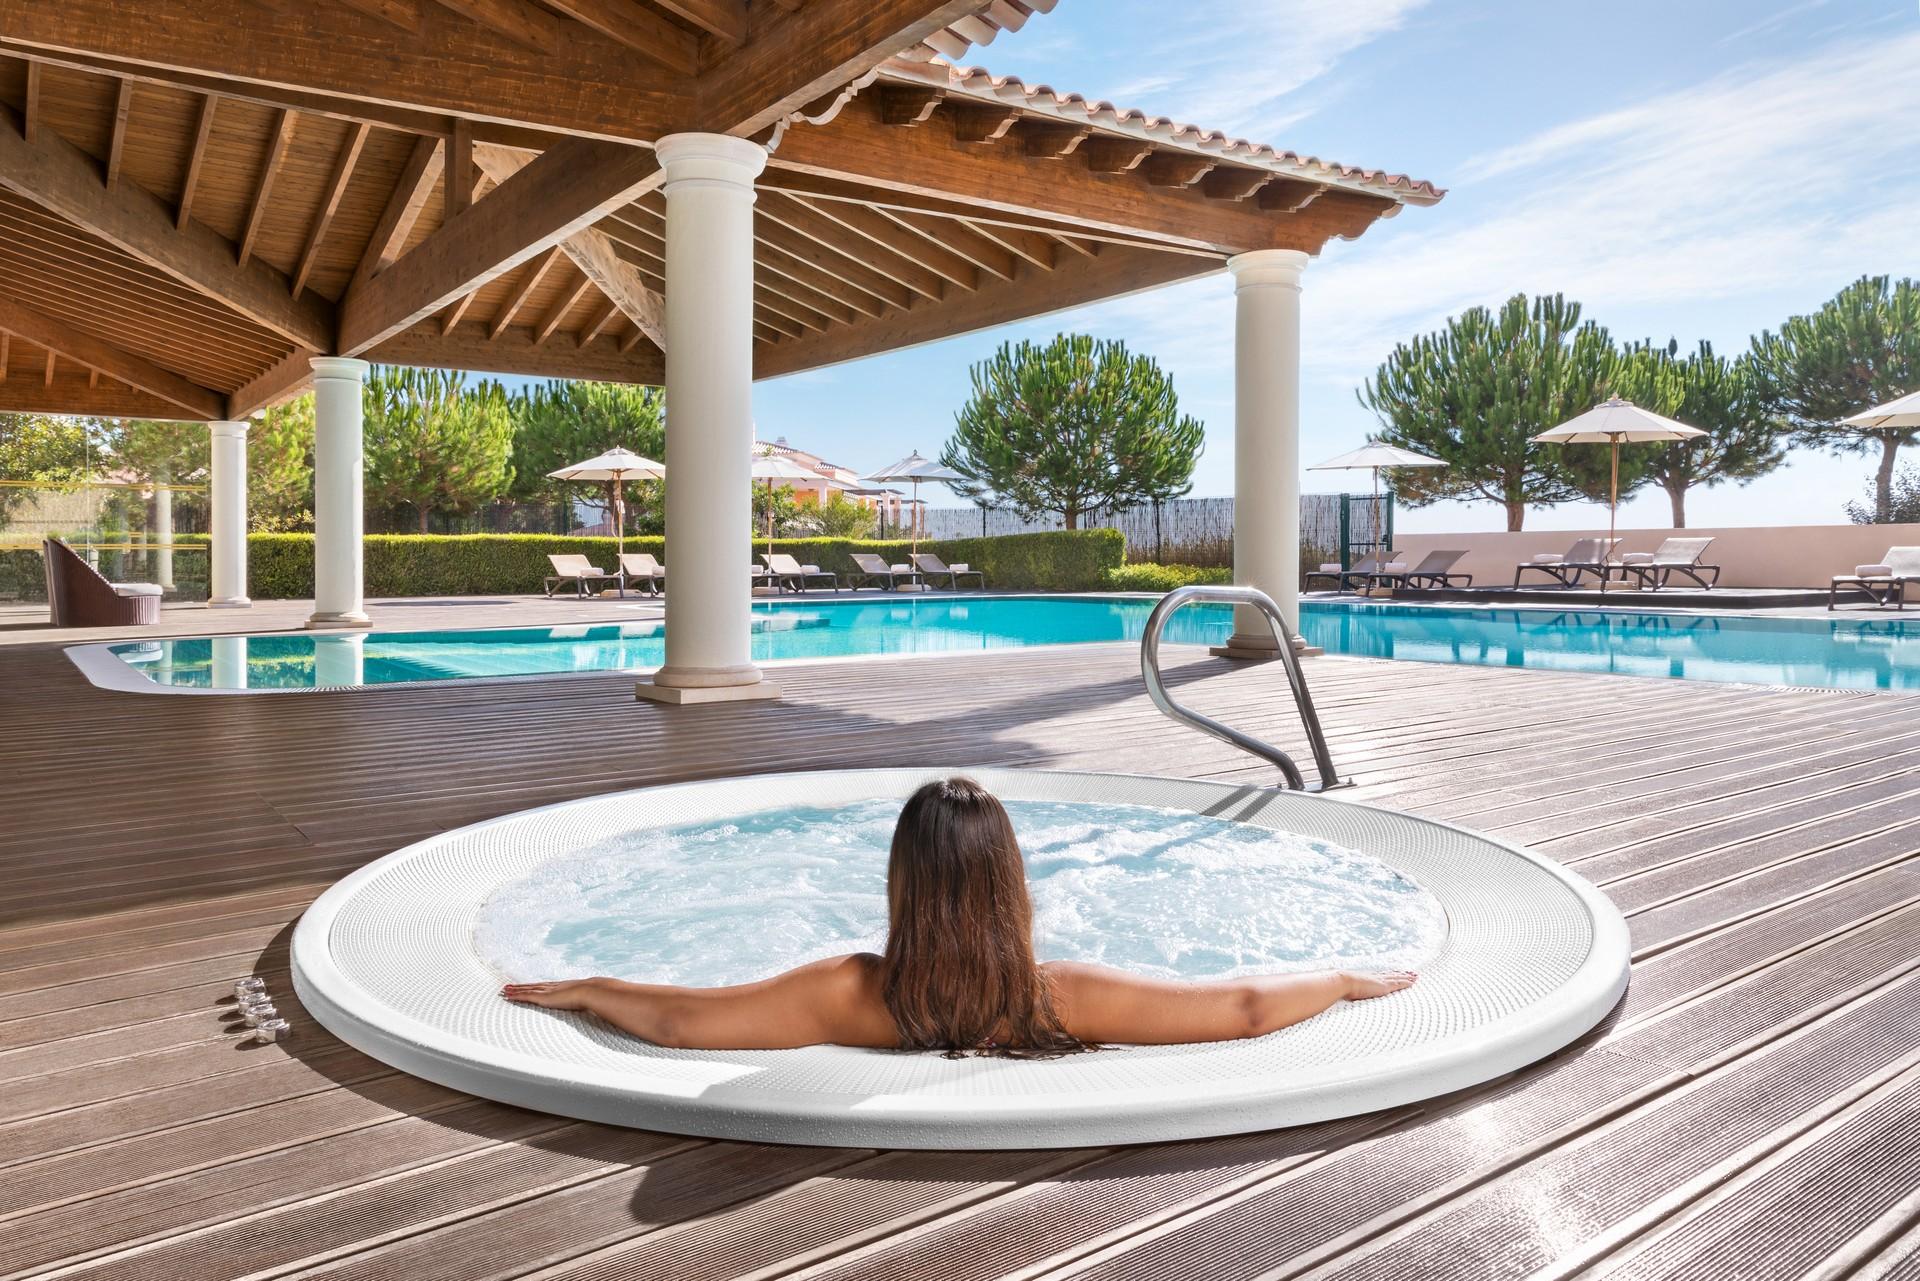 Best Portuguese Spas best portuguese spas Best Portuguese Spas: Cascade Wellness & Lifestyle Resort Best Portuguese Spas 1 1